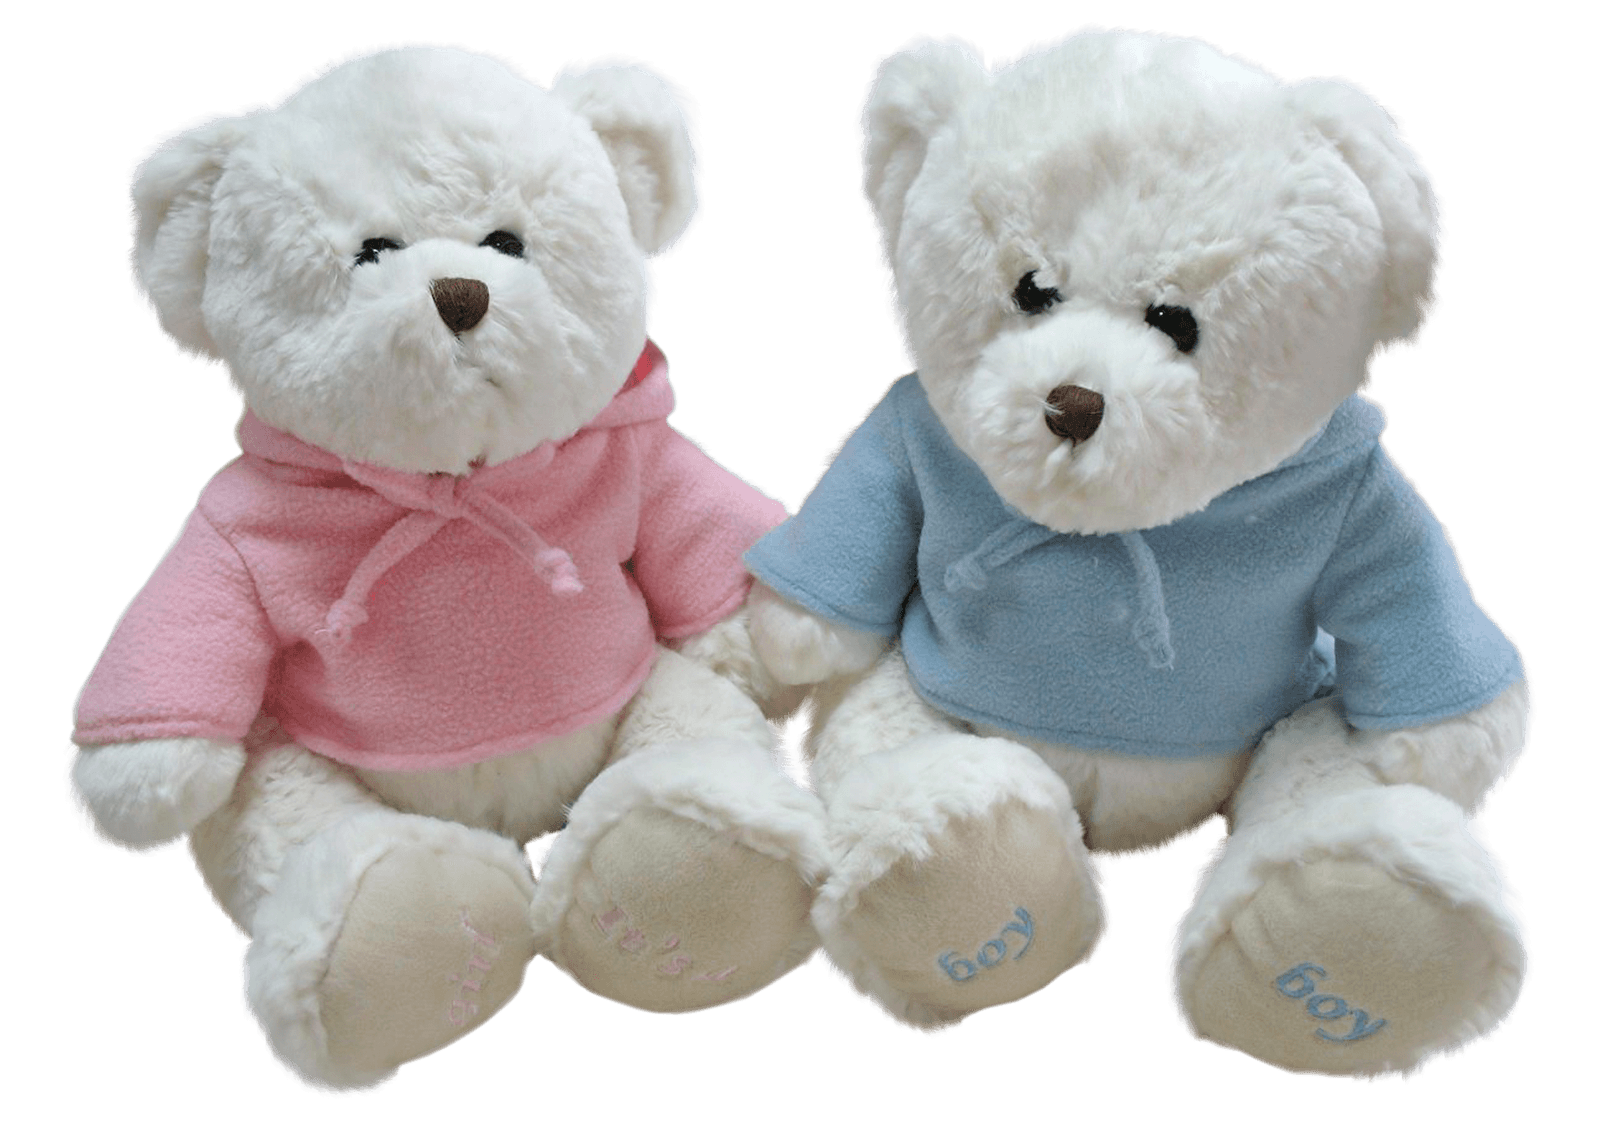 Patrones de osos de peluche | Blog | Pinterest | Patrones de osito ...